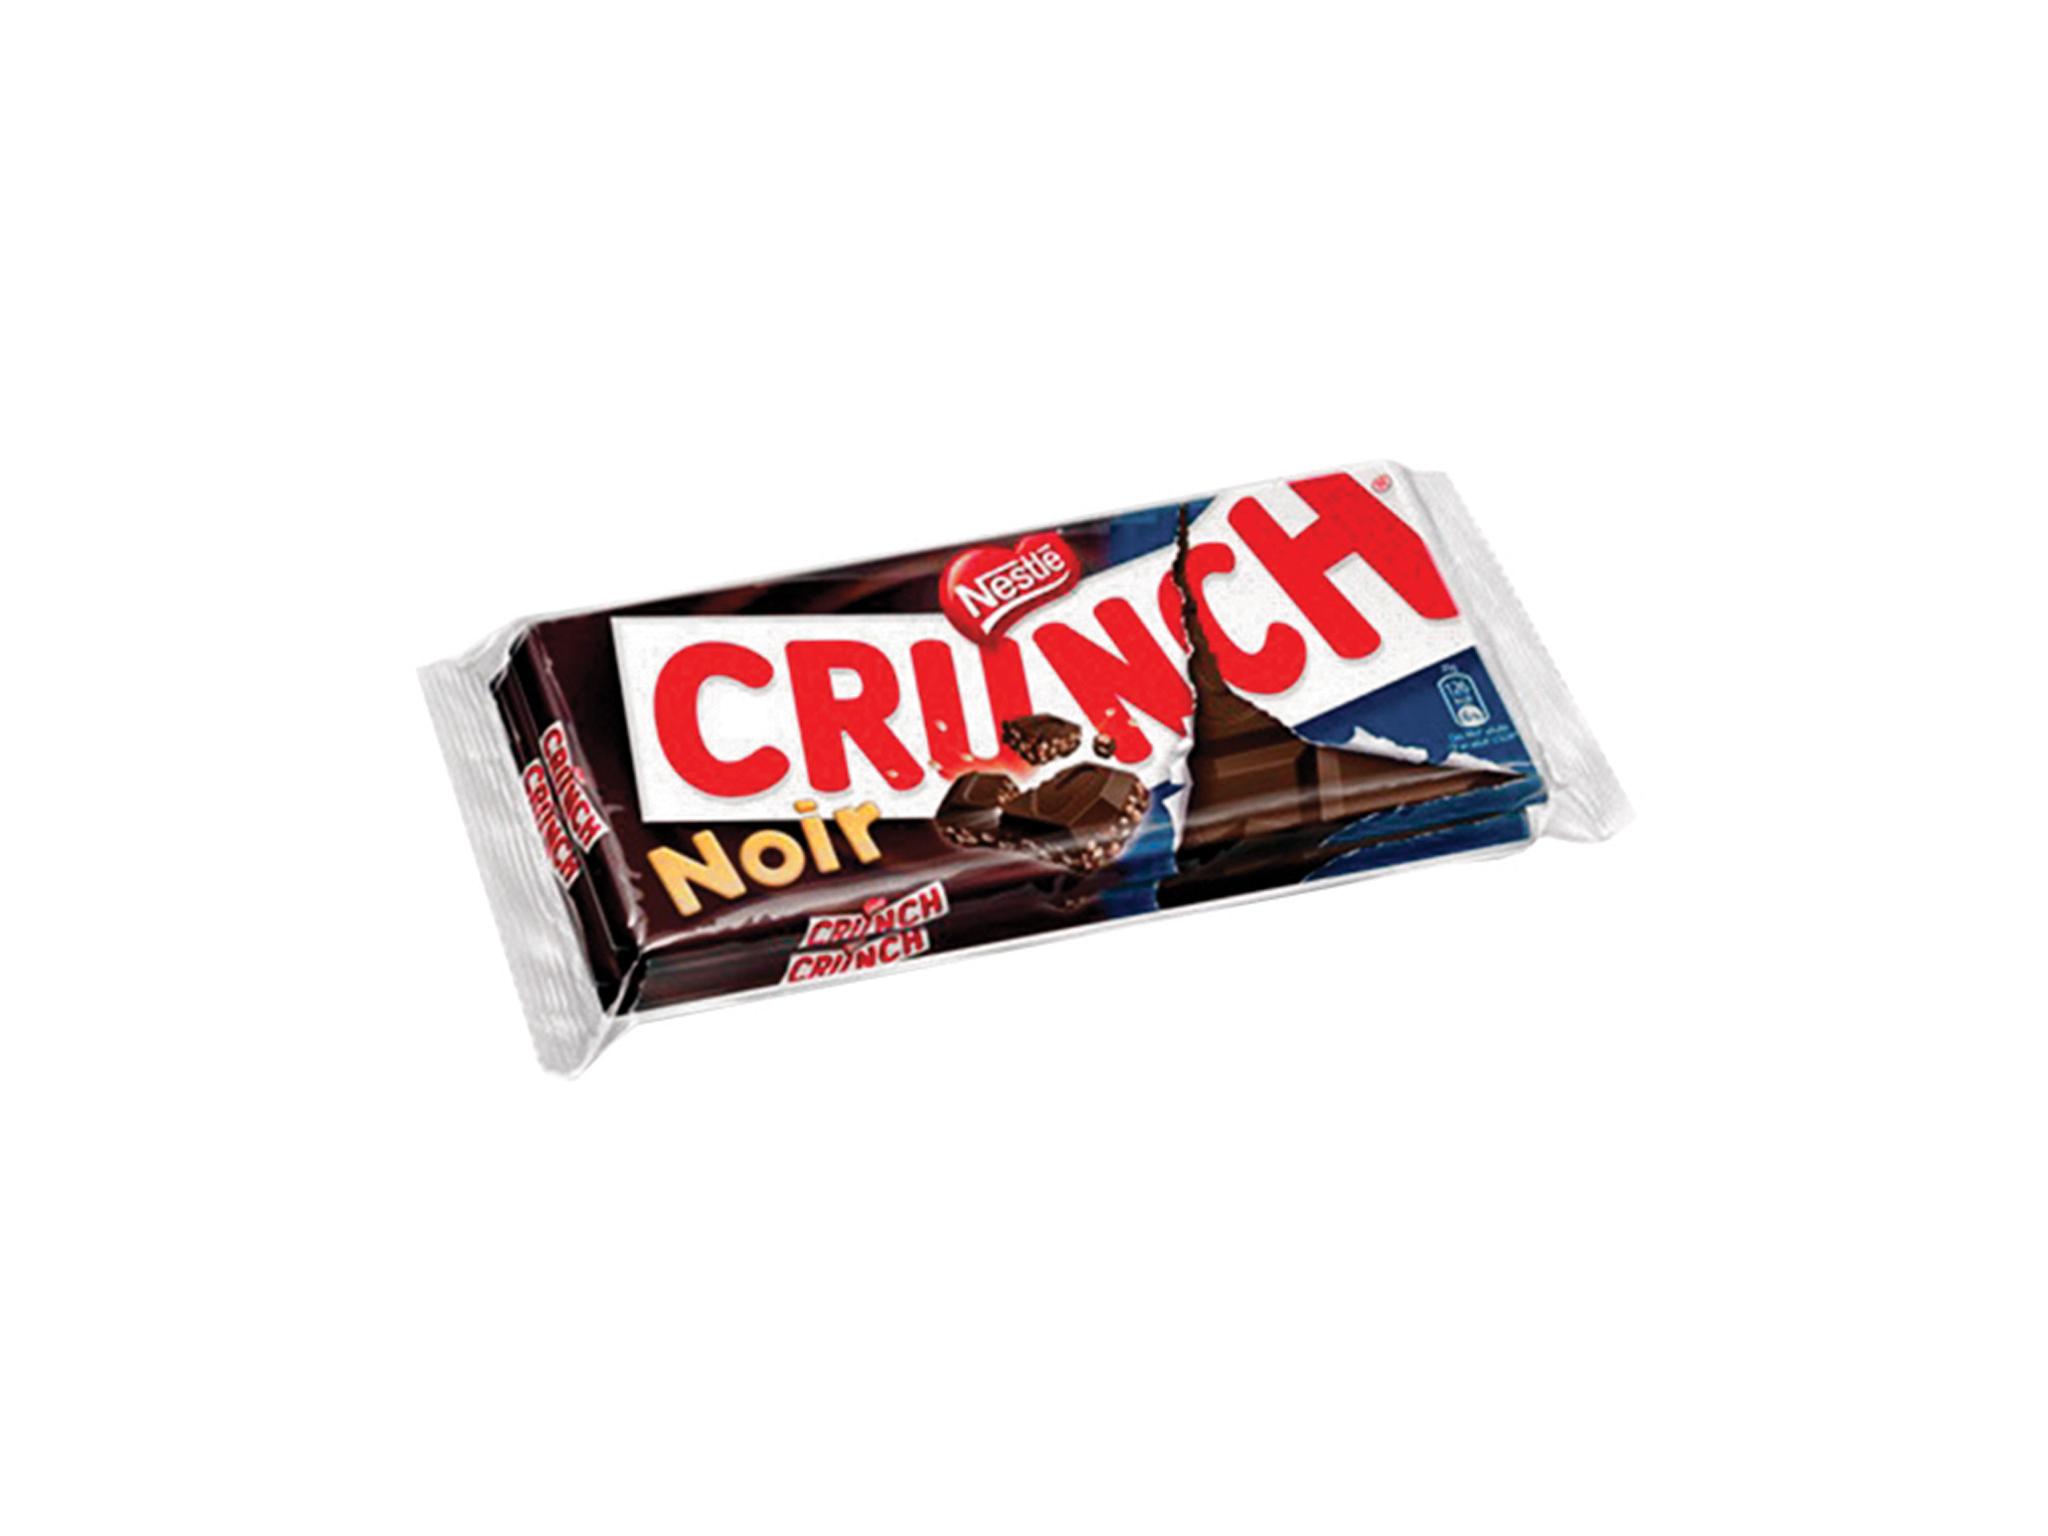 Crunch Noir - Nestle